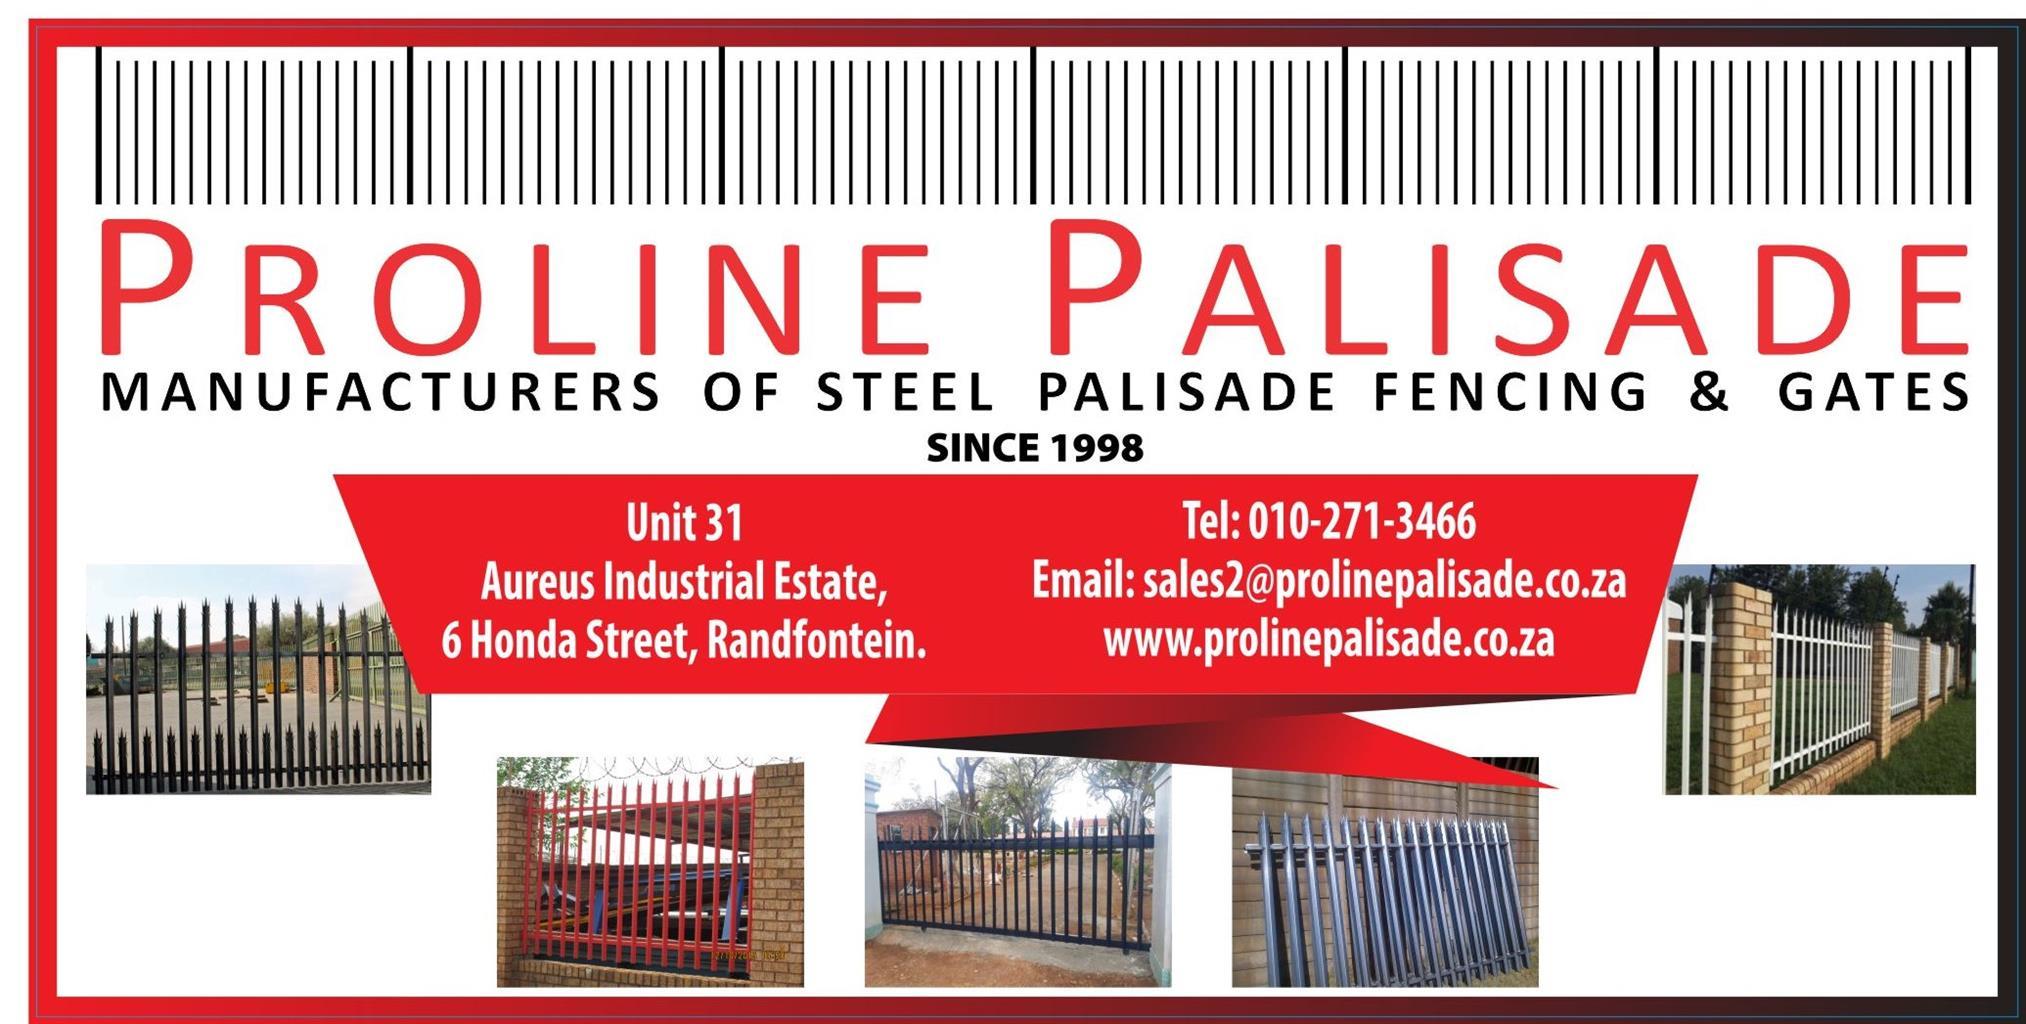 PROLINE PALISADE - FENCING INSTALLATION ACCESSORIES